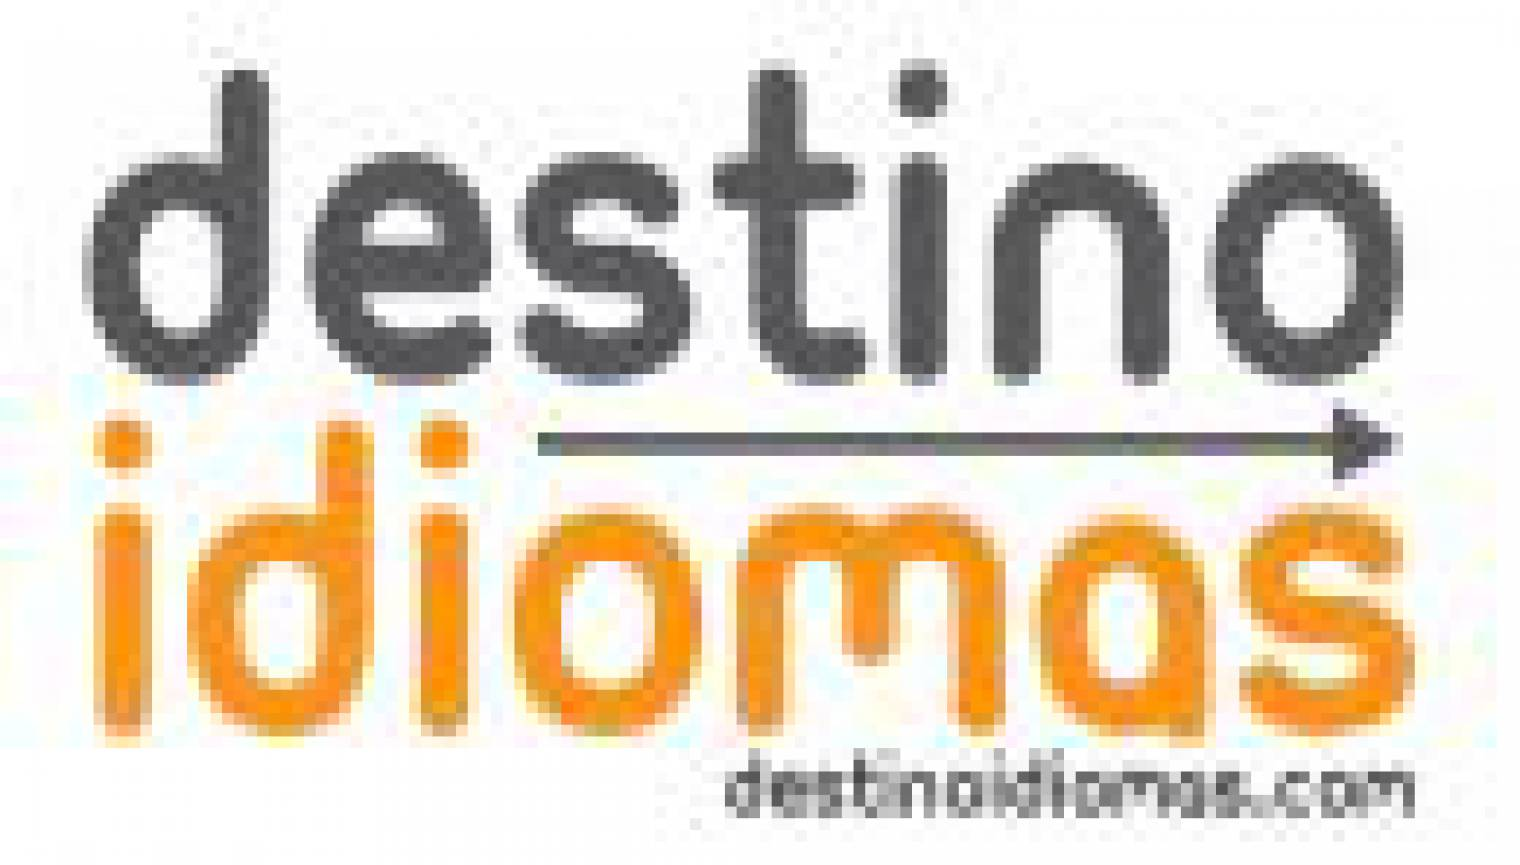 We welcome our latest Affiliate Member: Destino Idiomas, Spain